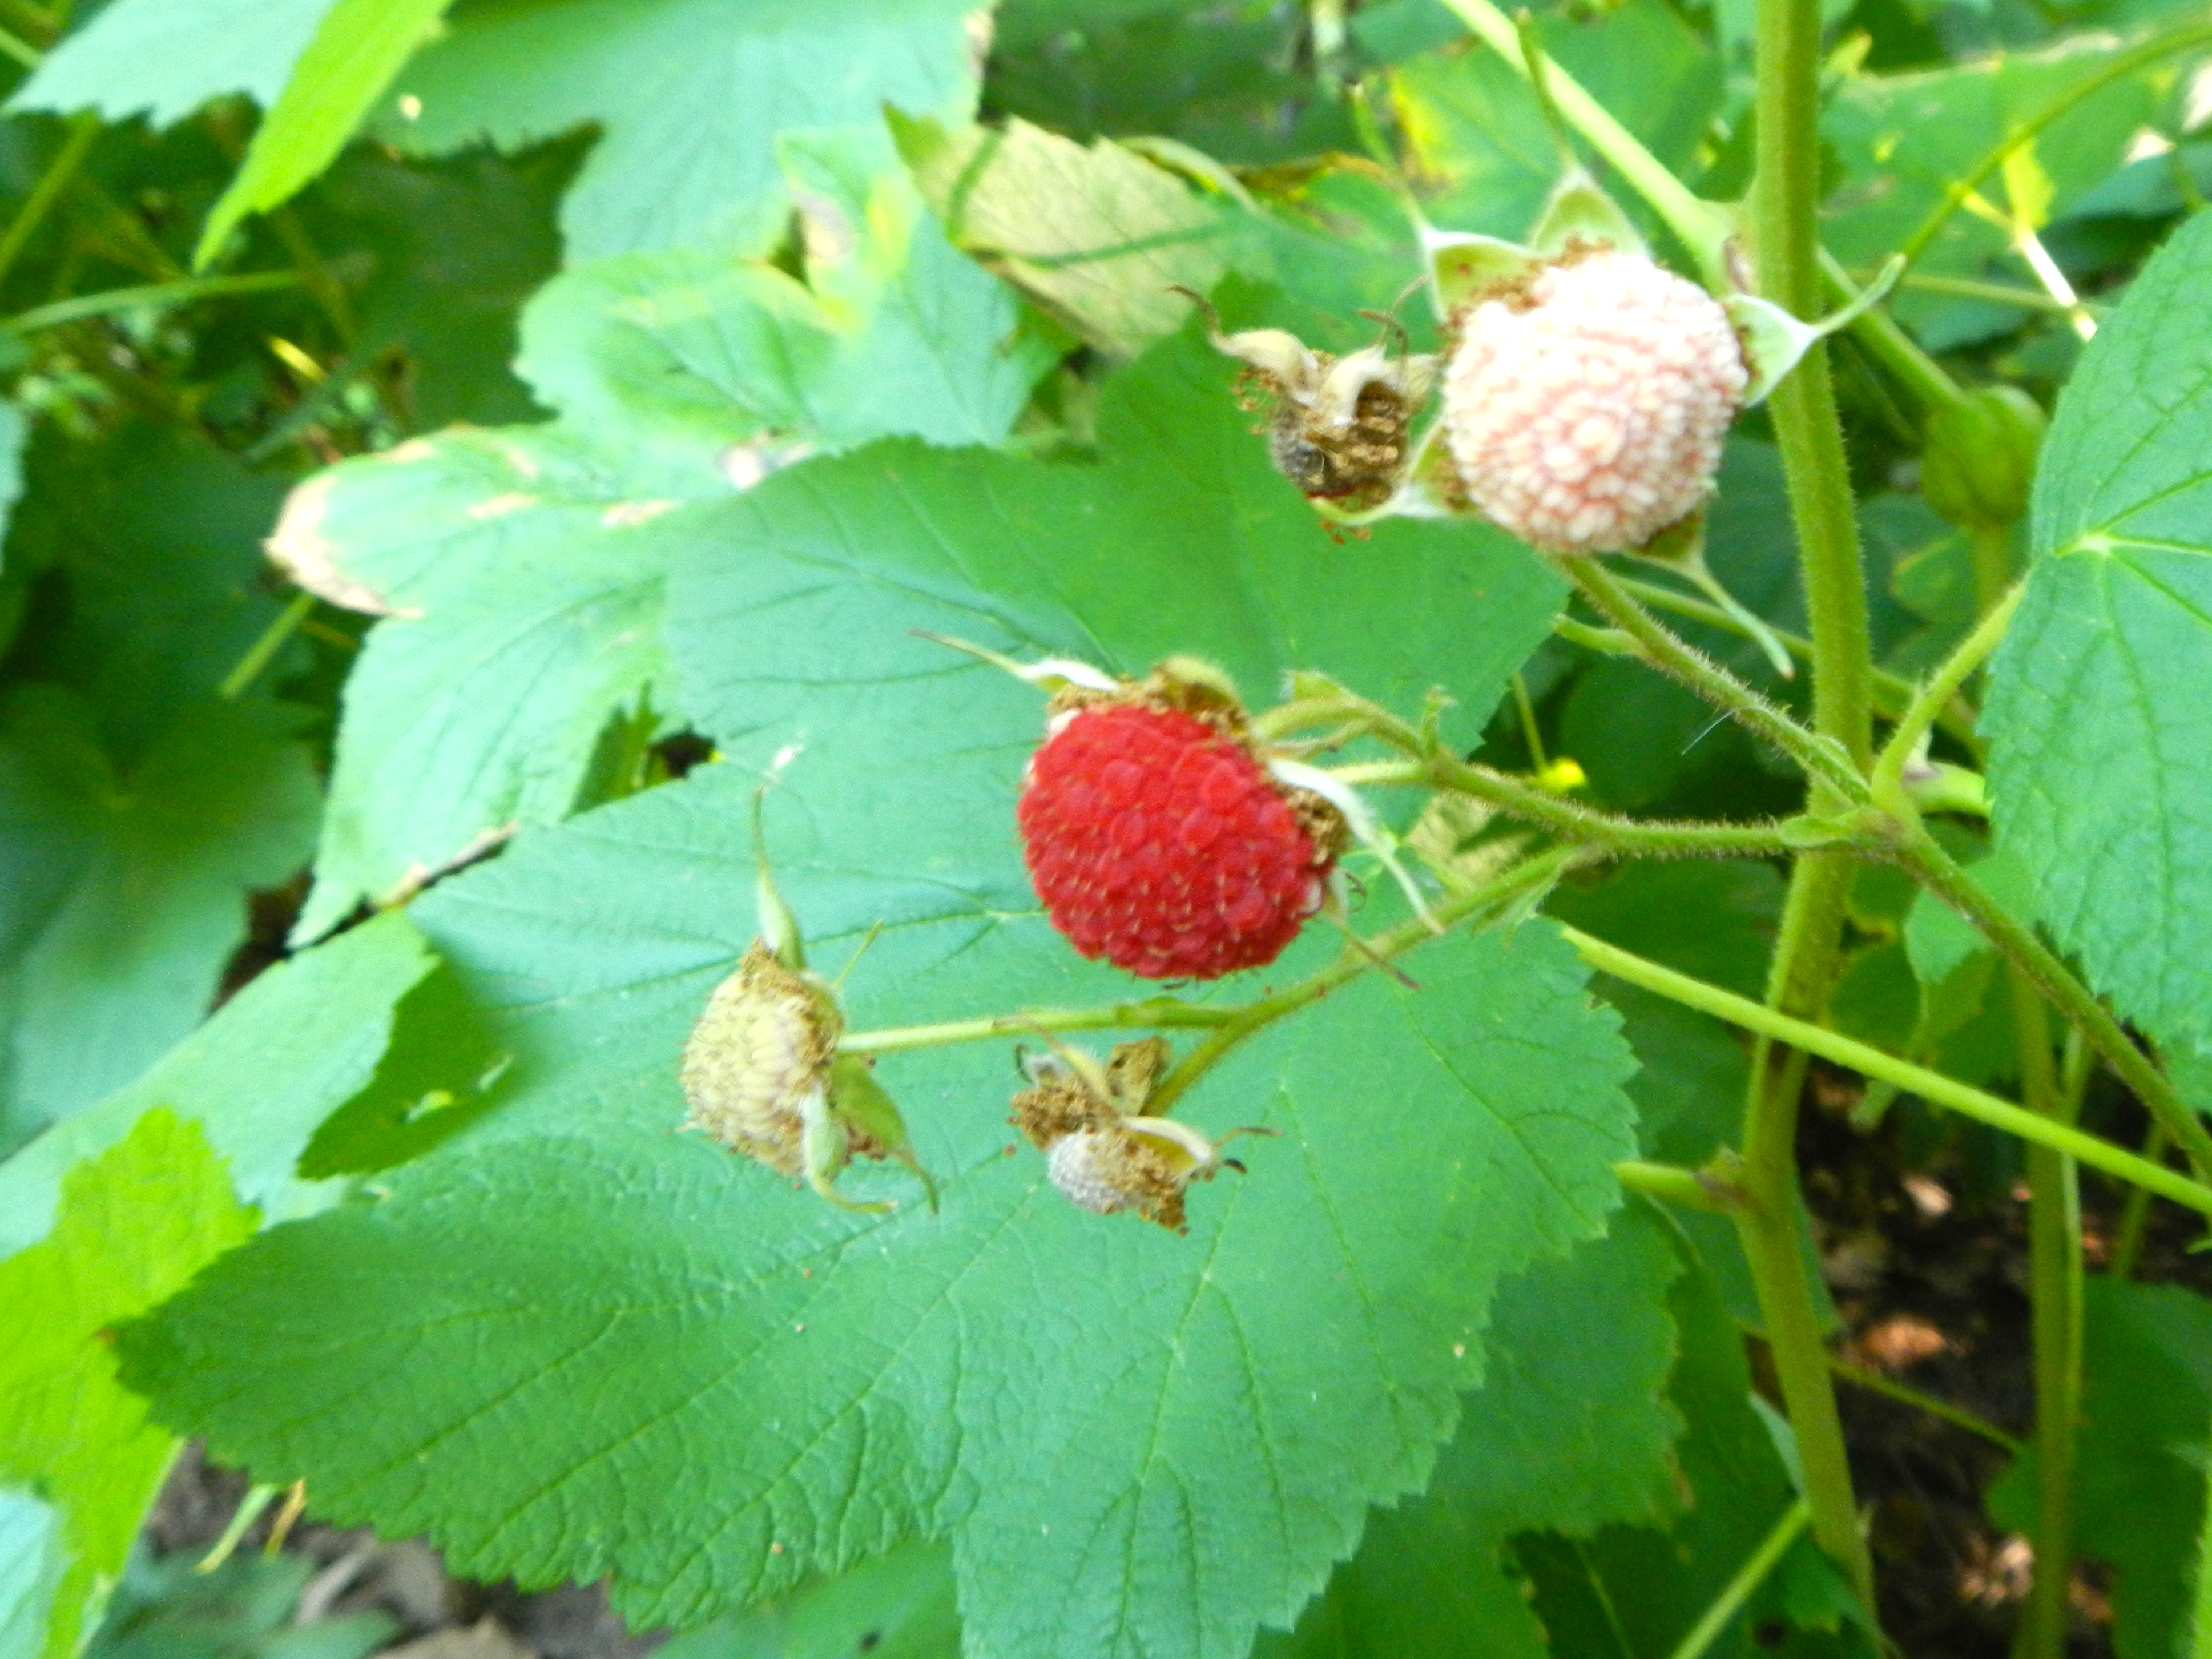 Ripened thimbleberry